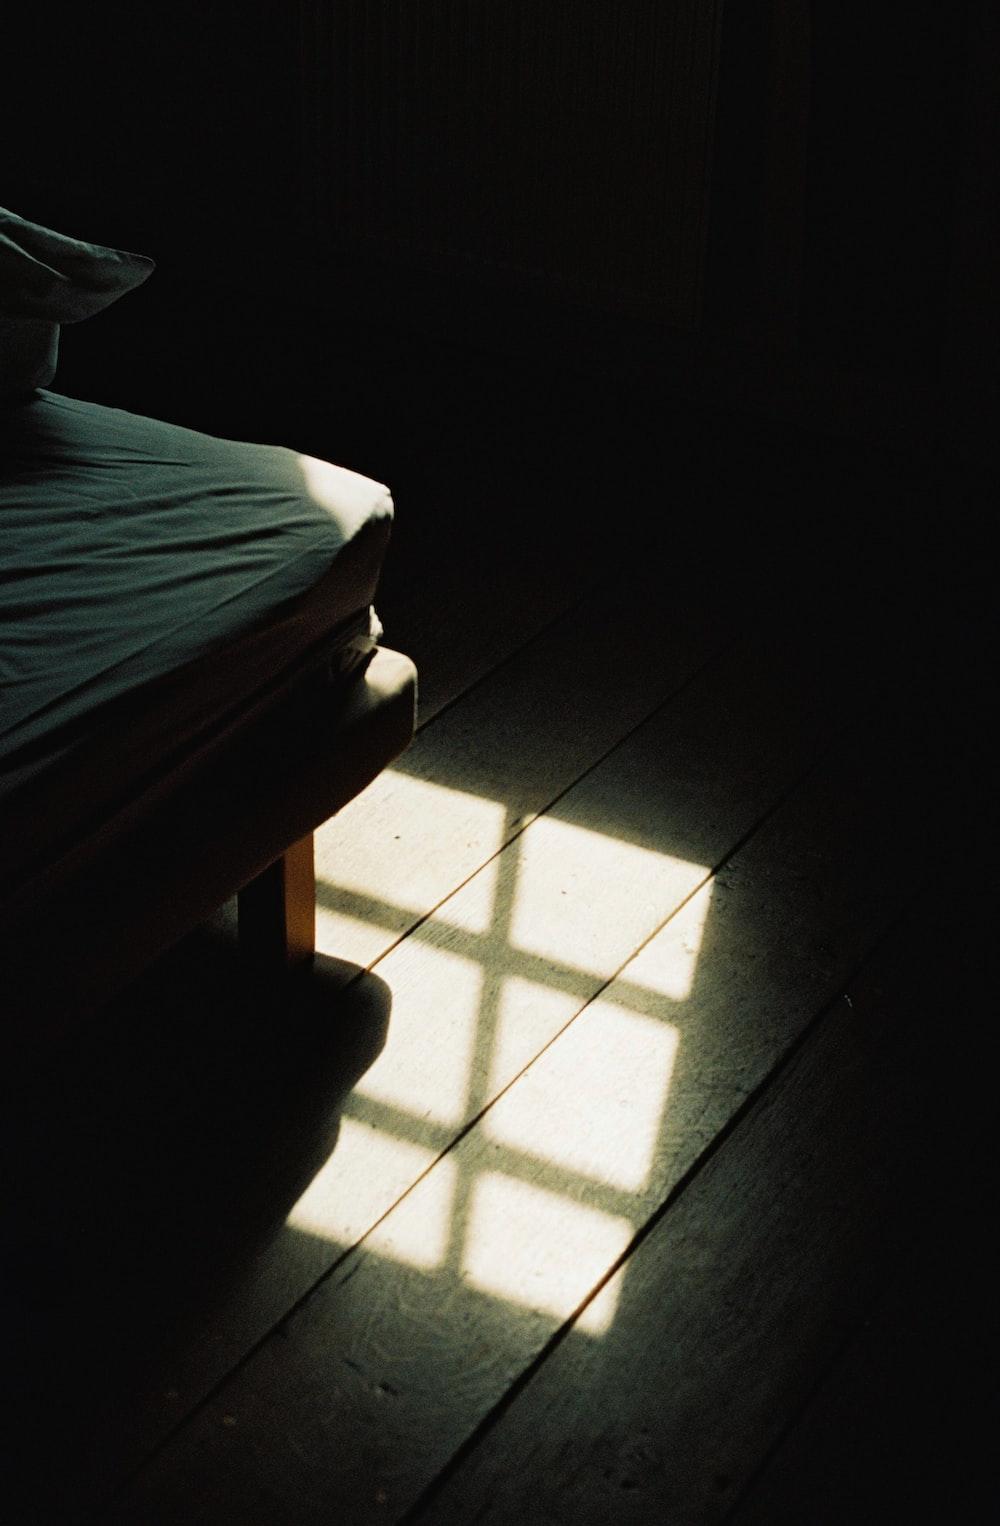 reflection of window on brown wooden floor